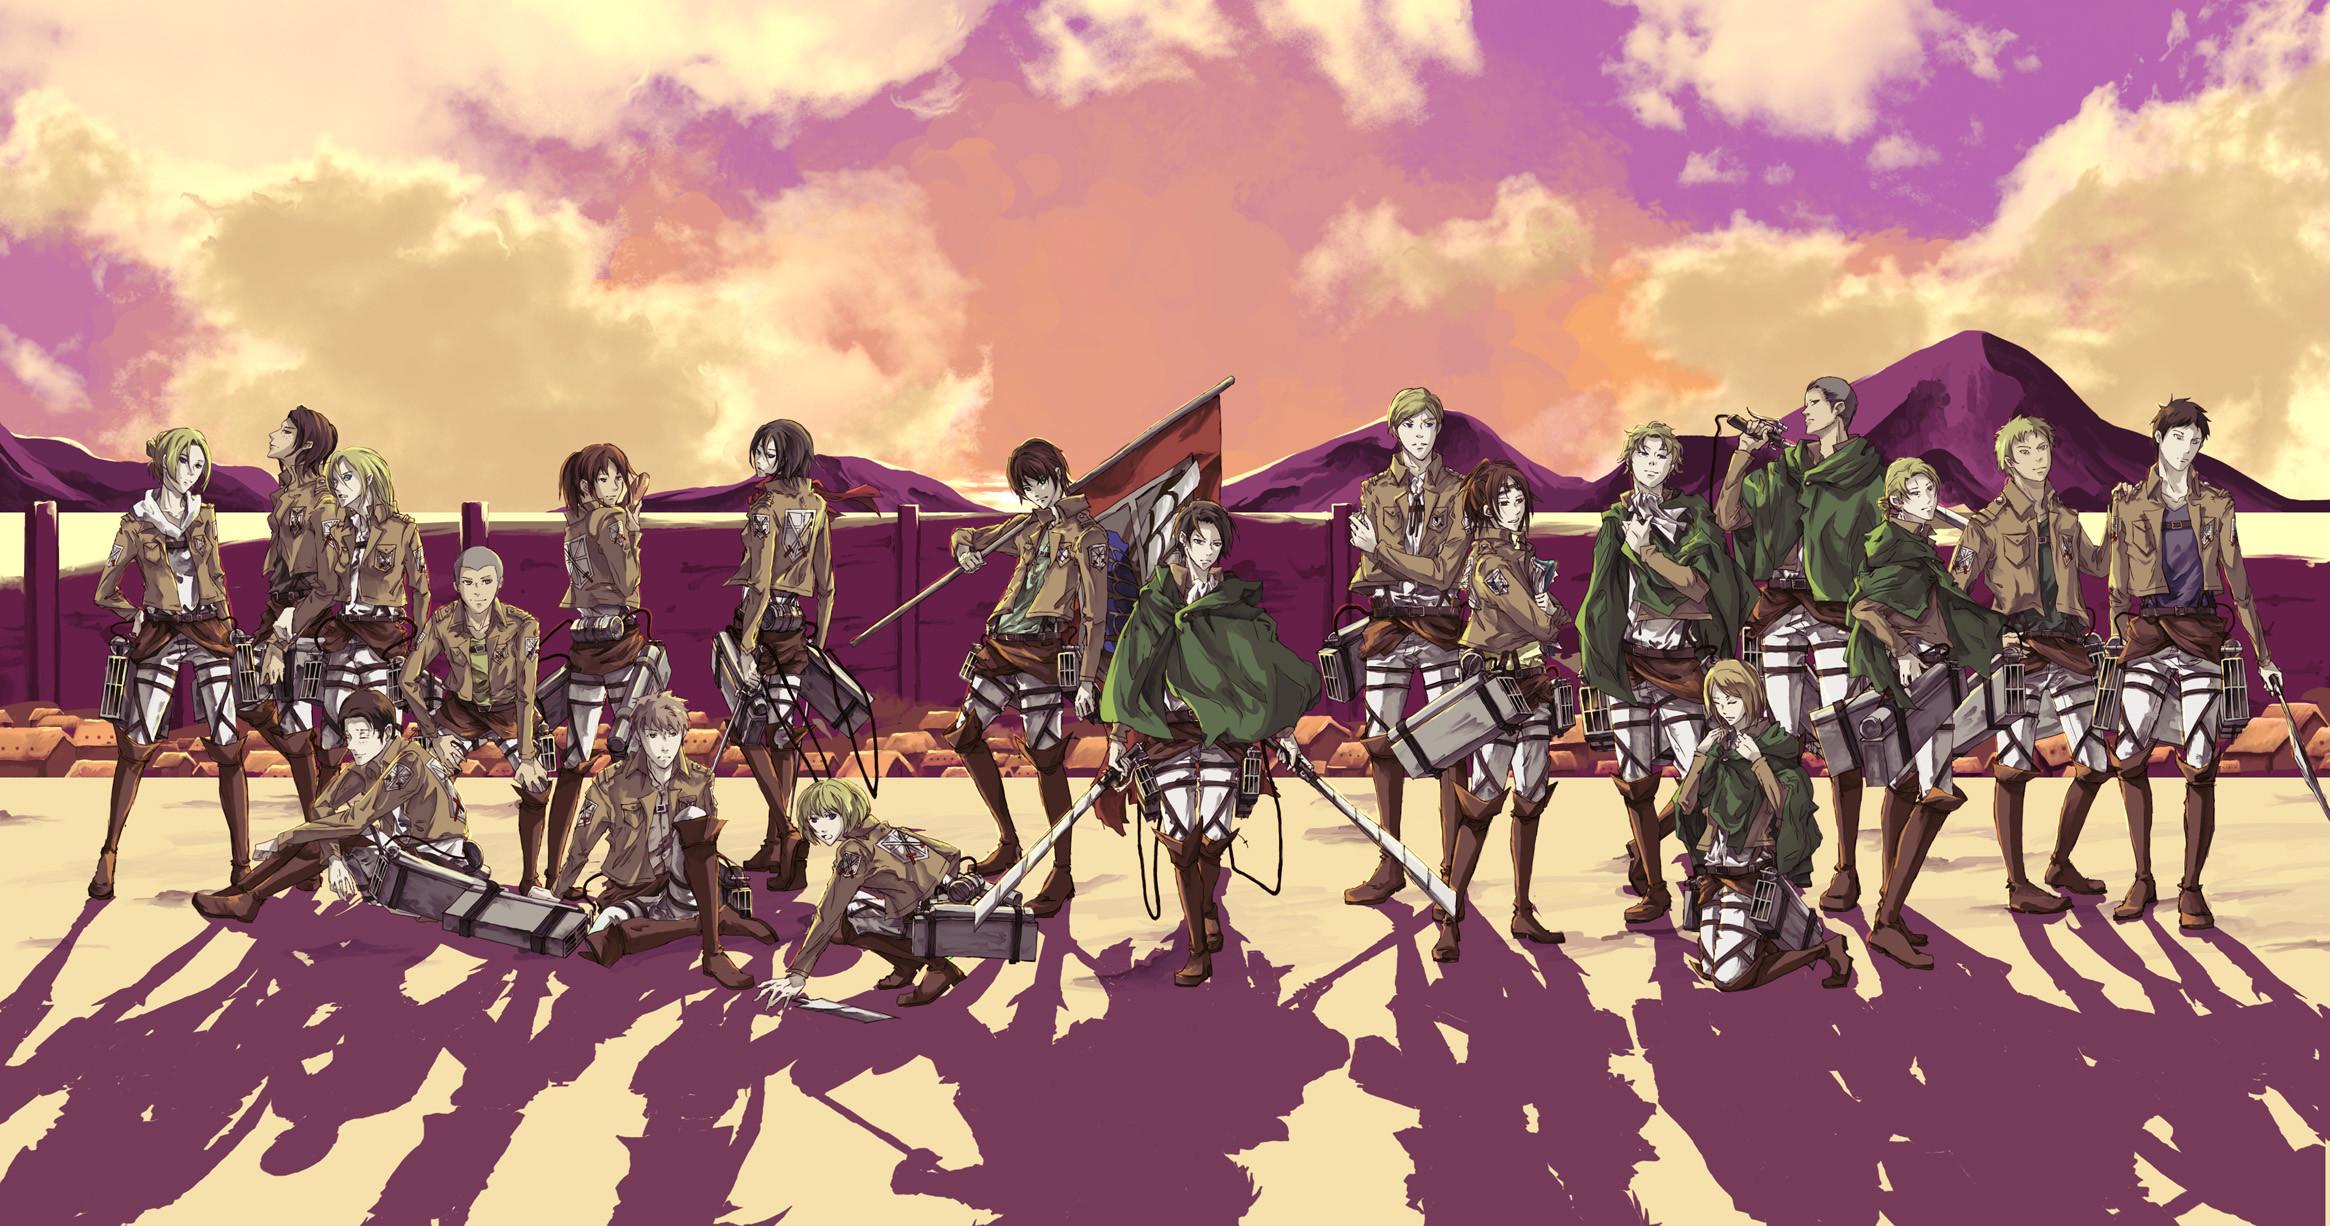 Anime – Attack On Titan Reiner Braun Sasha Blouse Ymir (Attack on Titan)  Petra